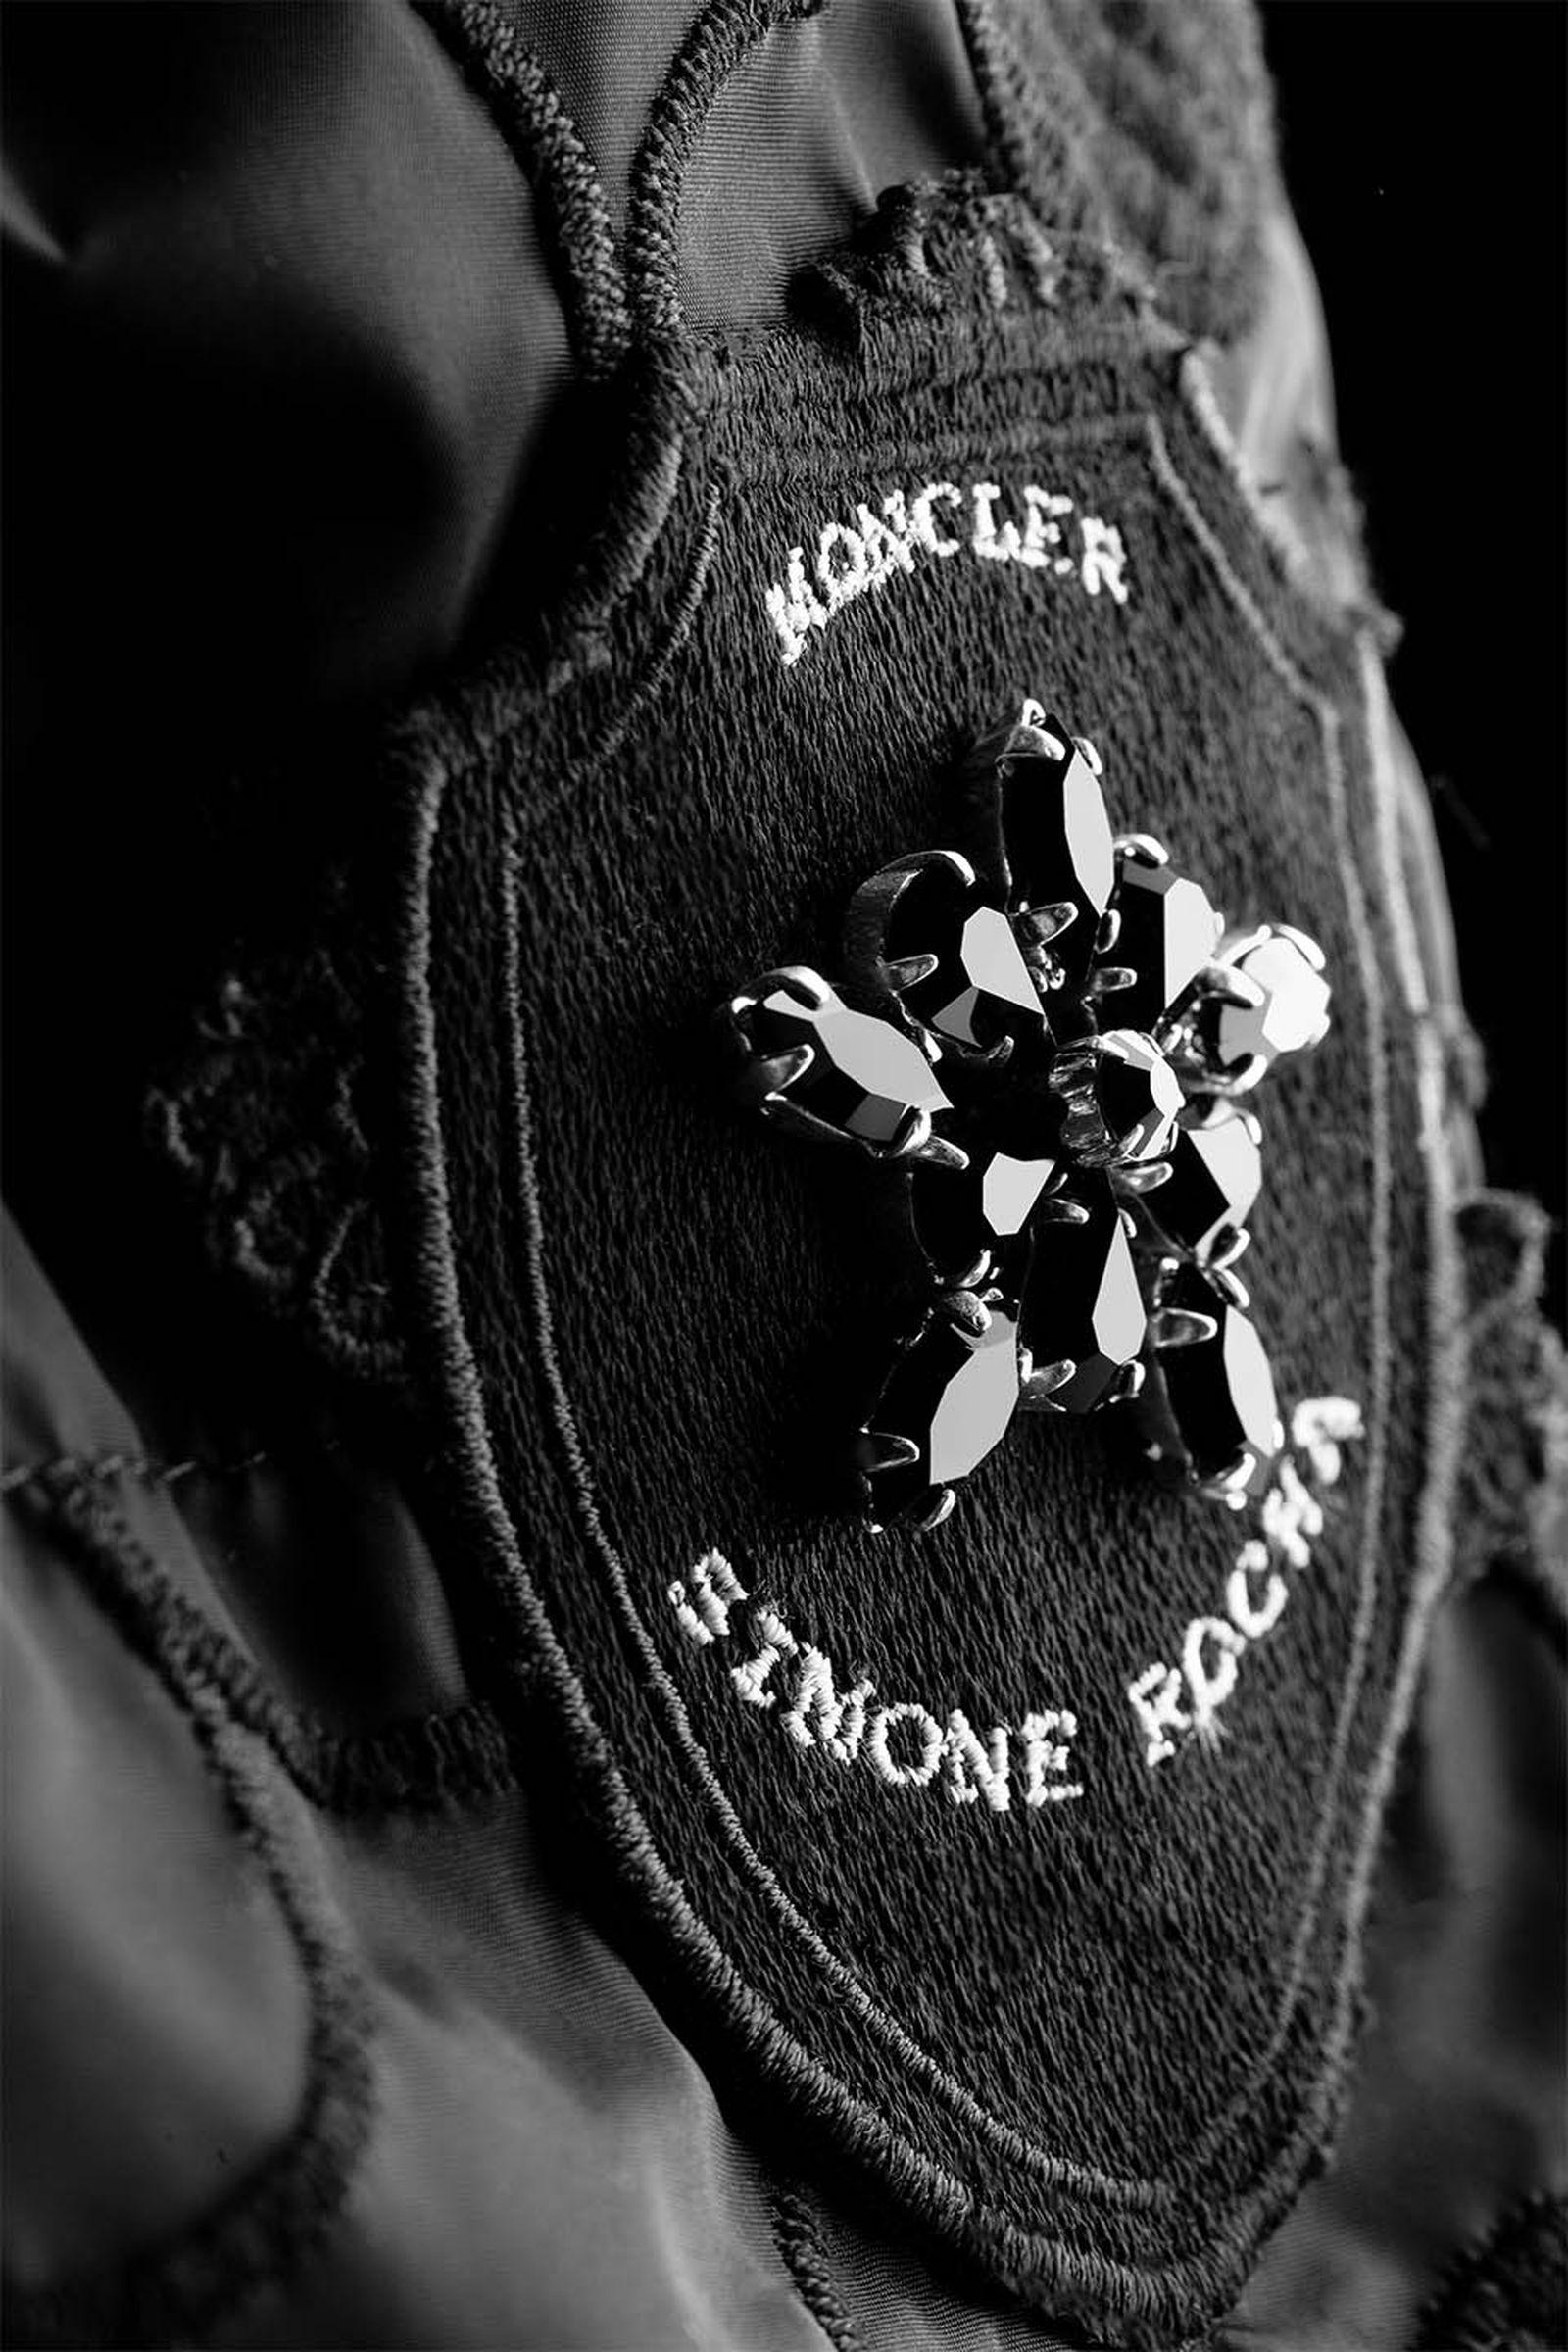 moncler genius 2019 simone rocha matthew williams moncler 1952